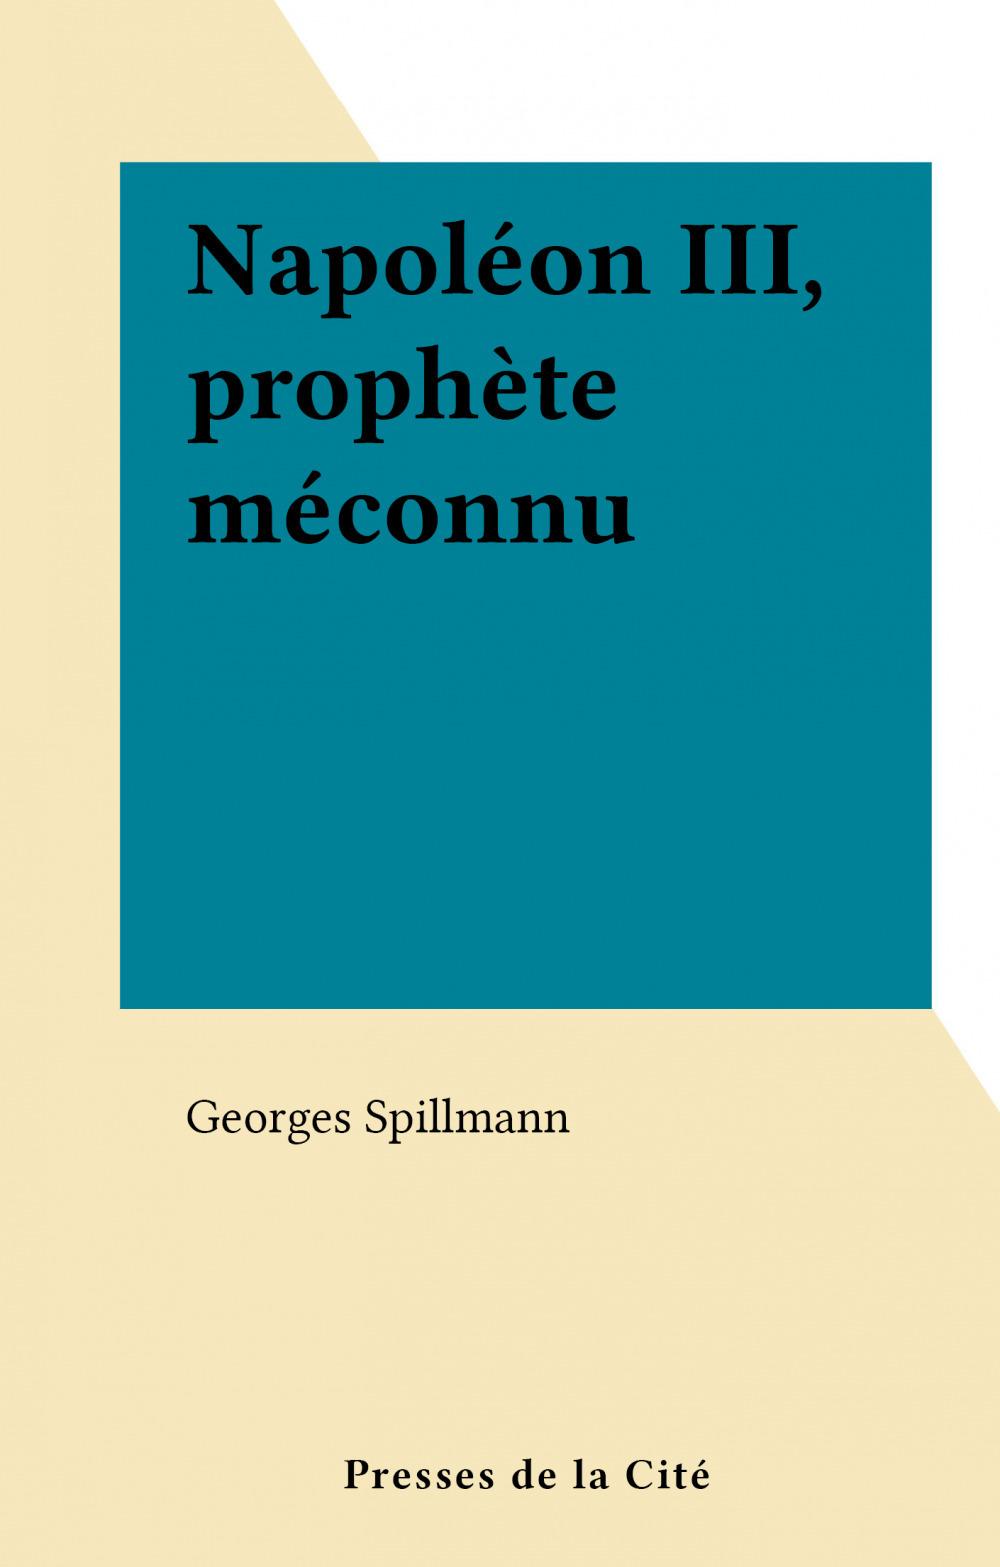 Napoléon III, prophète méconnu